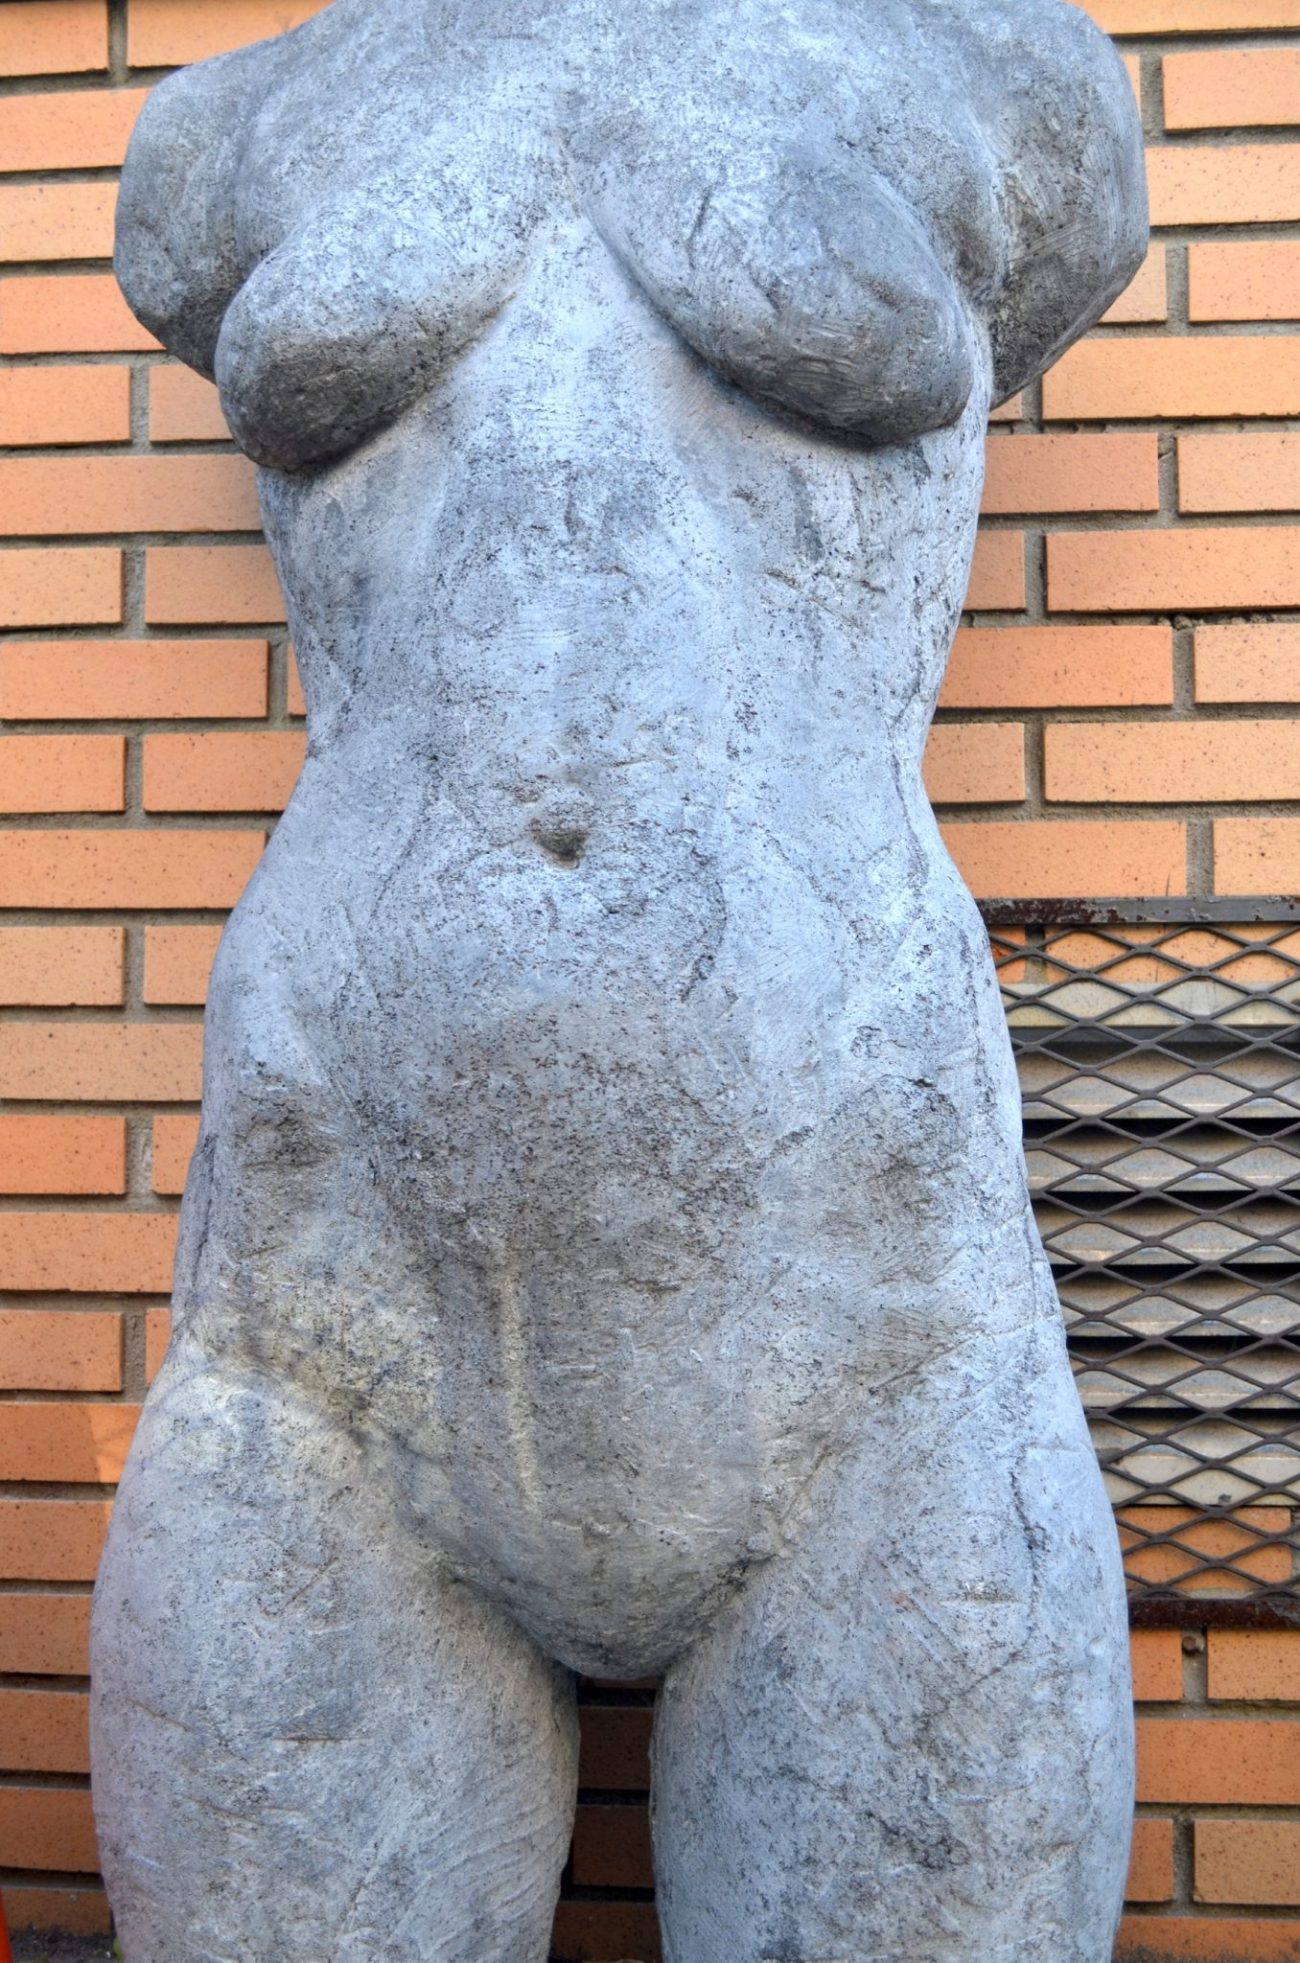 Nude Female Sculpture in Harlem